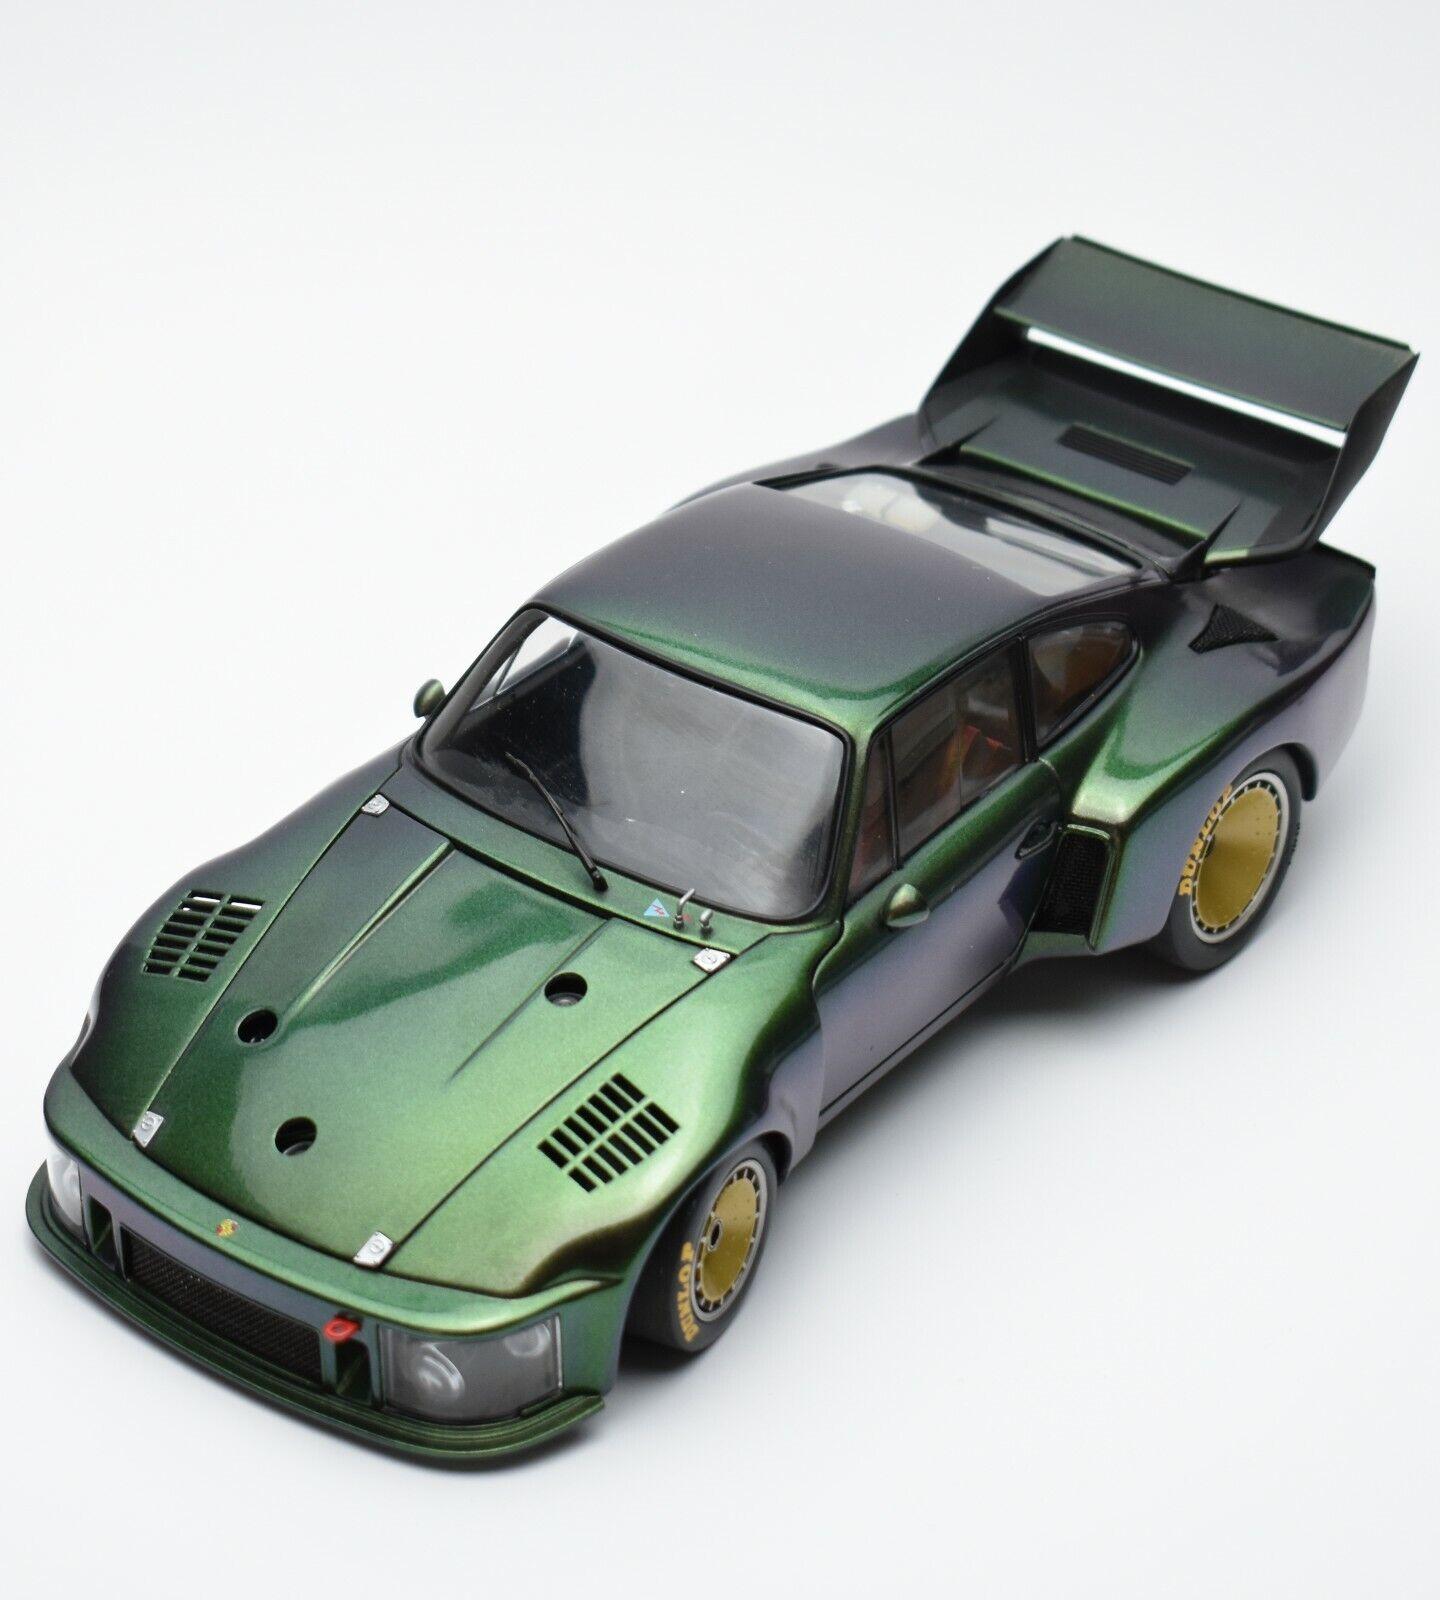 EXOTO Porsche 934 935 Avus Galaxy a 1680  extrêmement rare     1 18, NEUF dans sa boîte, k019